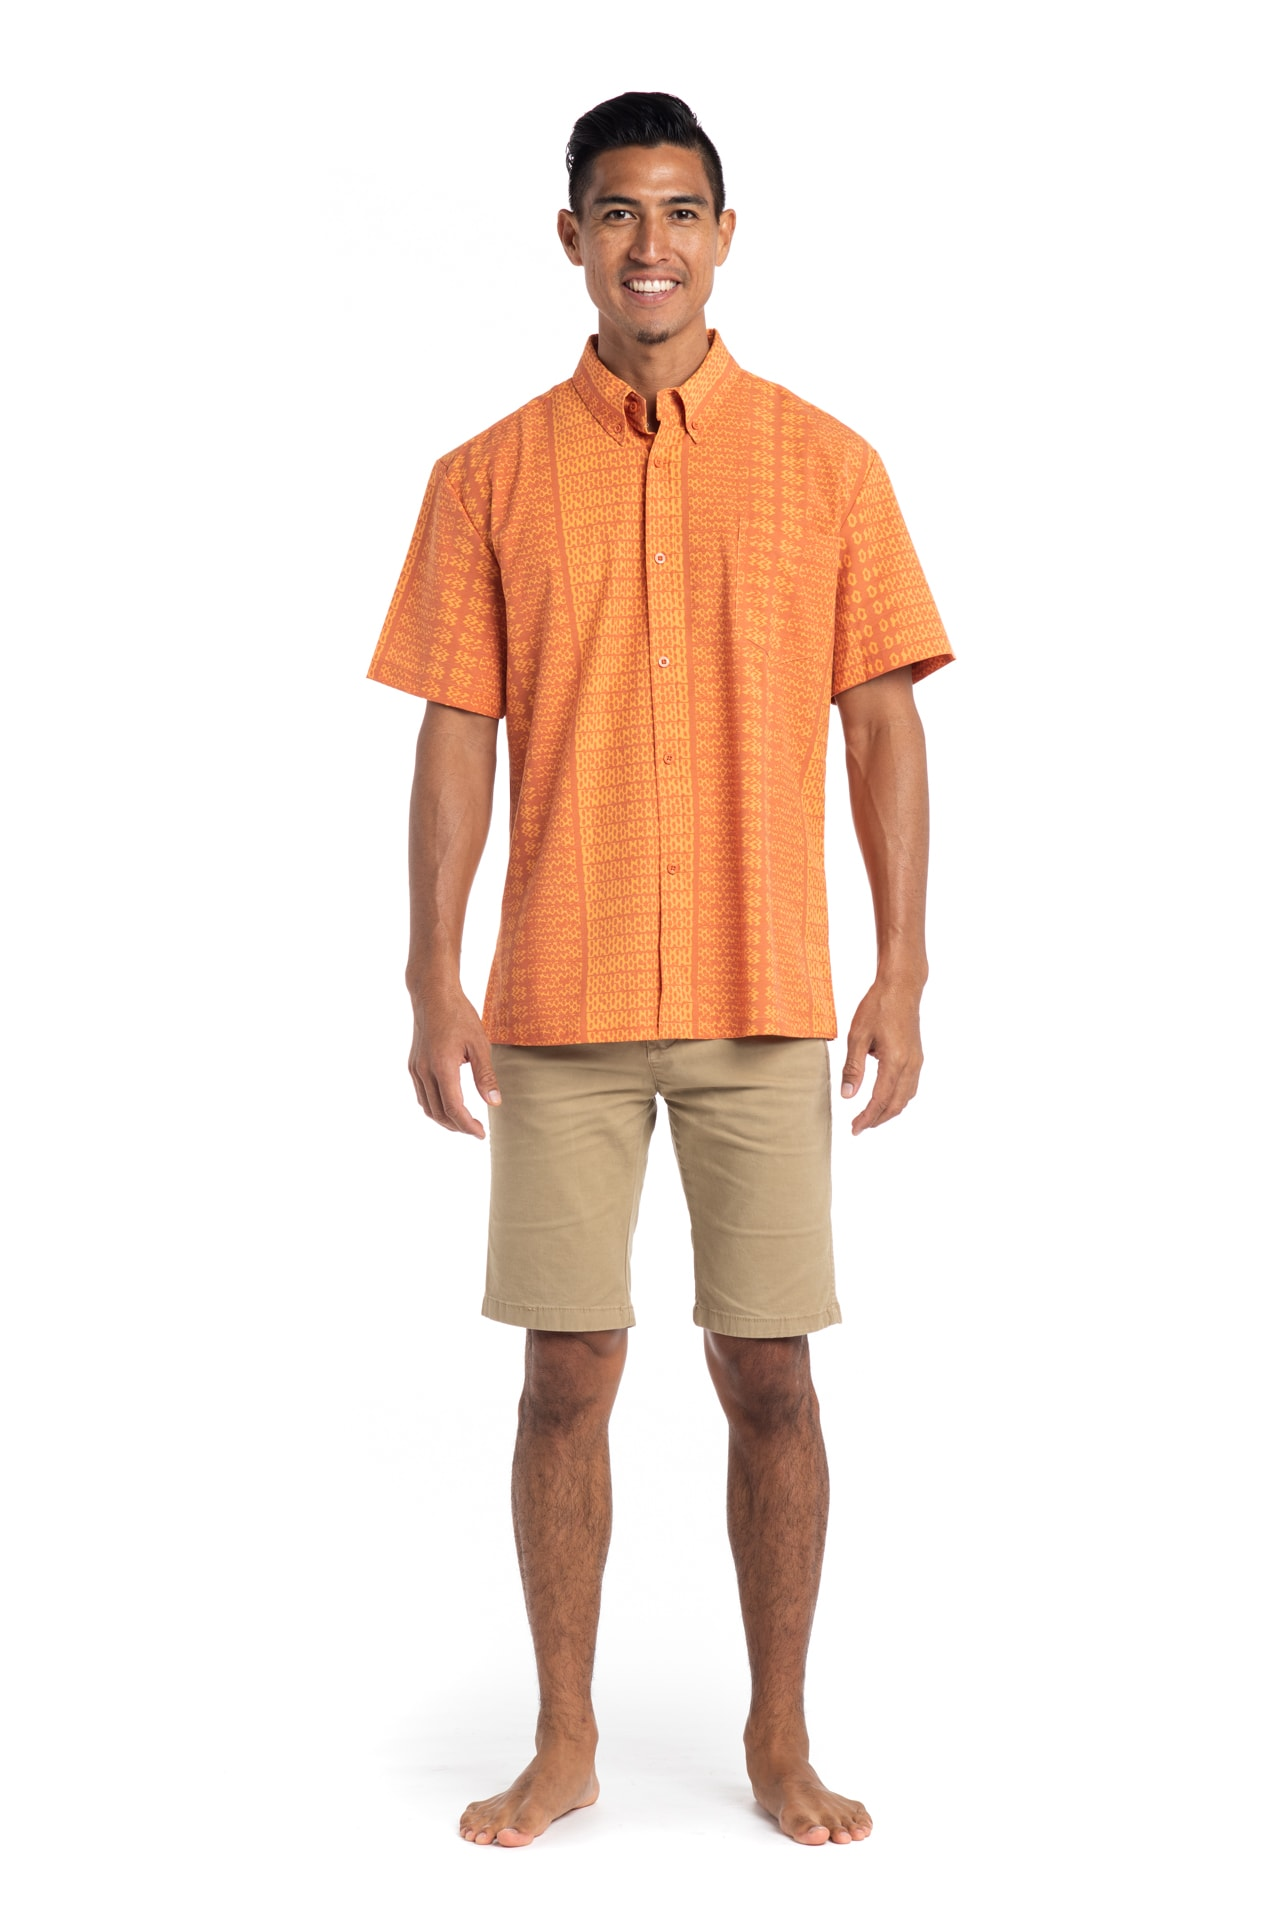 Male model wearing Mahalo Nui Shirt in Orange AkoaAkoa - Front View